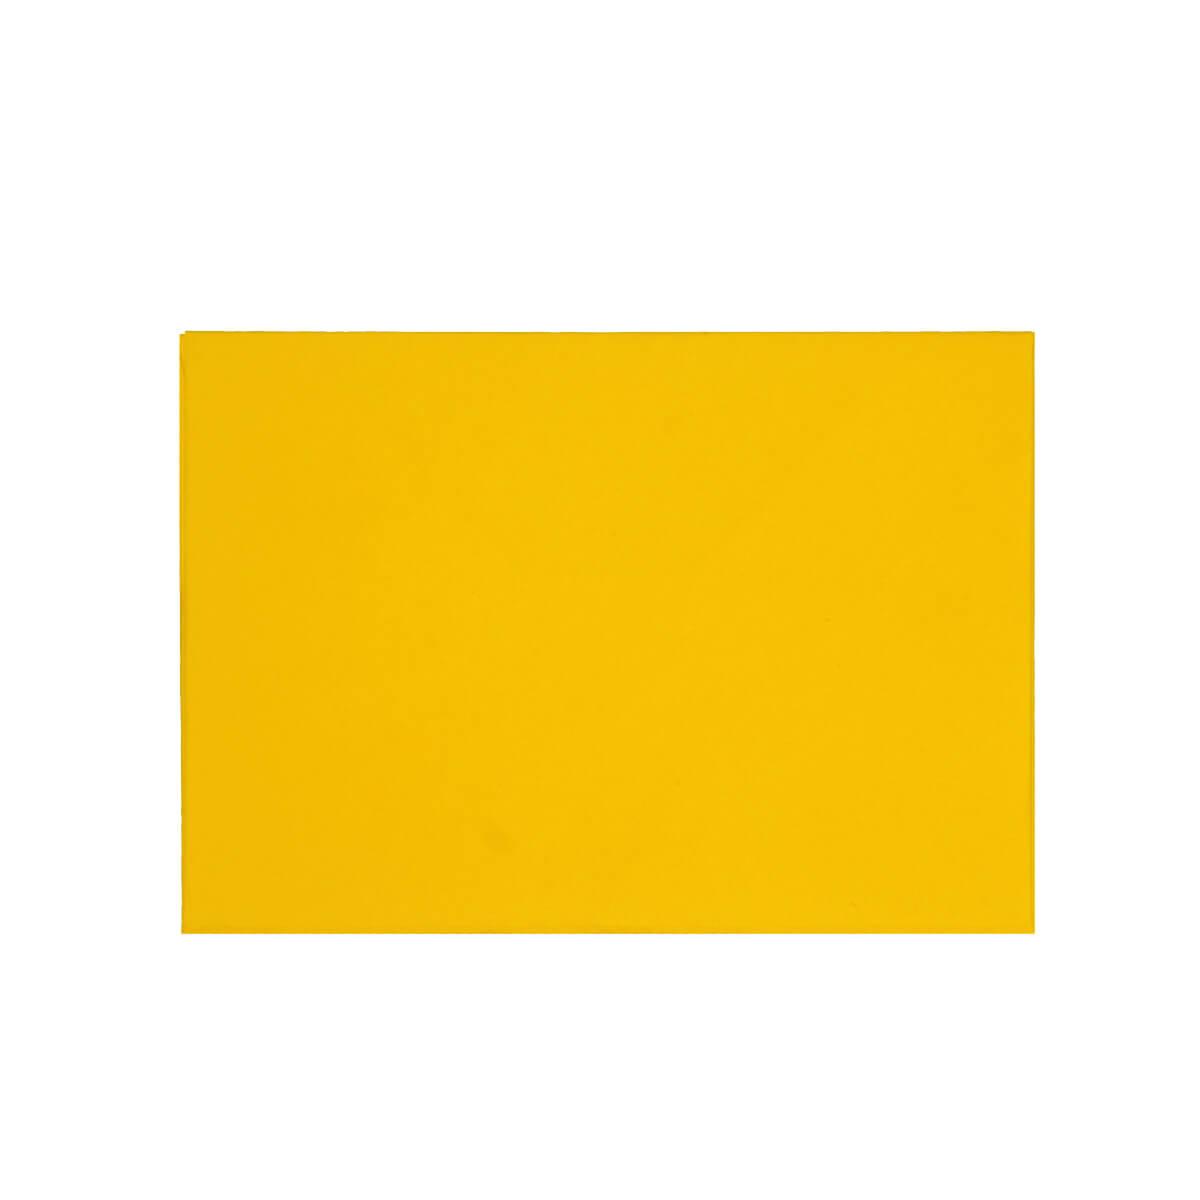 DAFFODIL YELLOW 70 x 100 mm GIFT TAG ENVELOPE (i2)